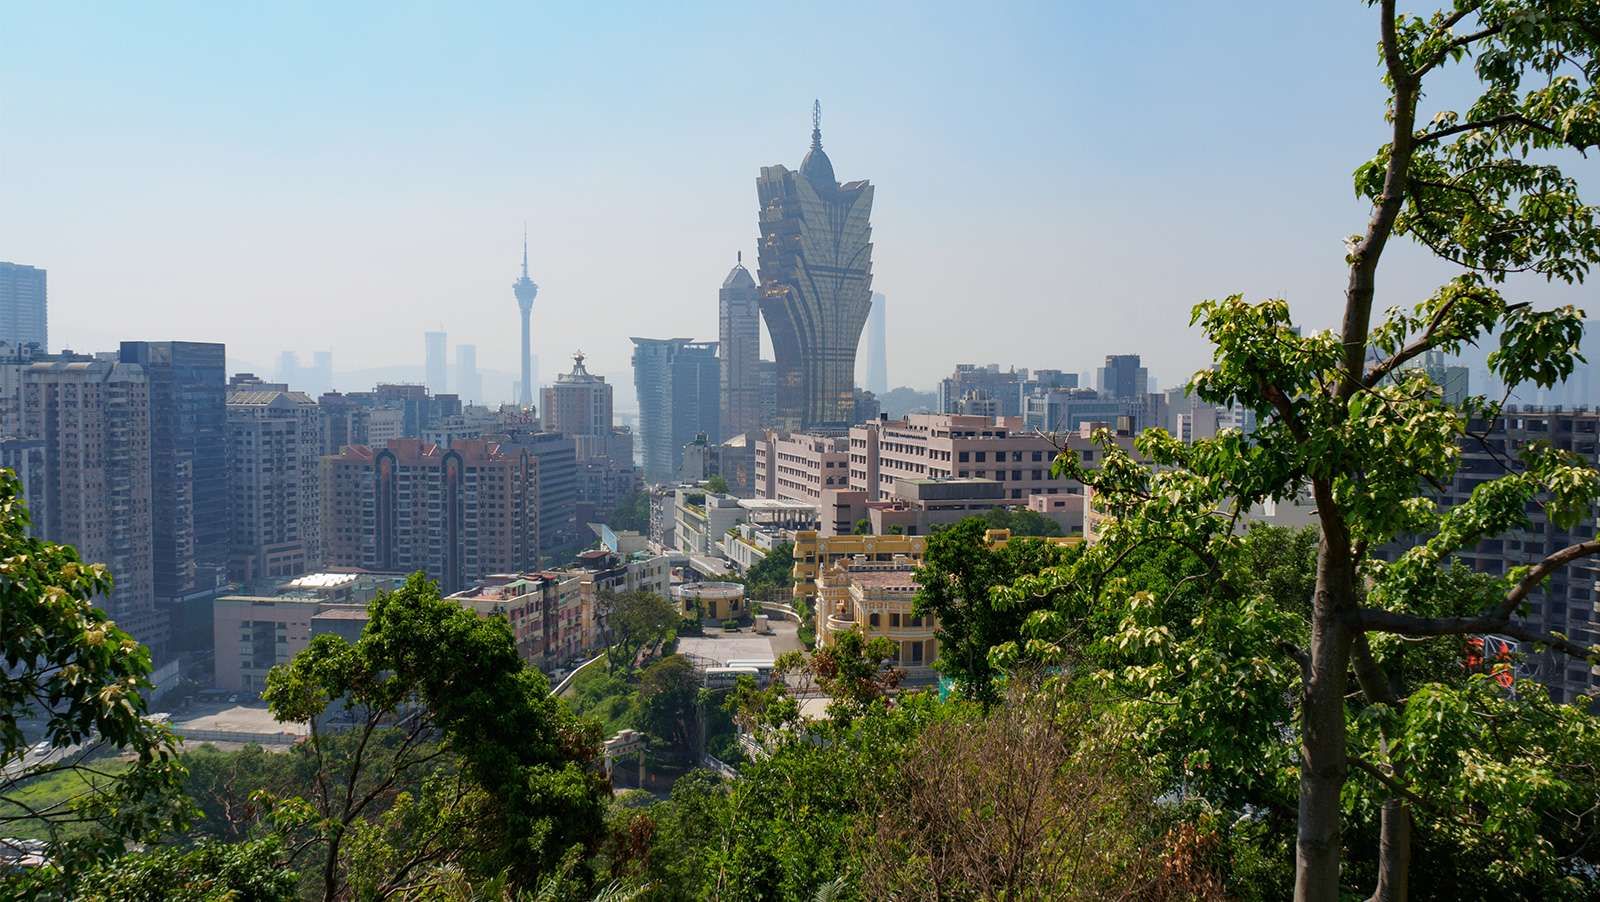 Macau casino labor group pushing for a summer bonus